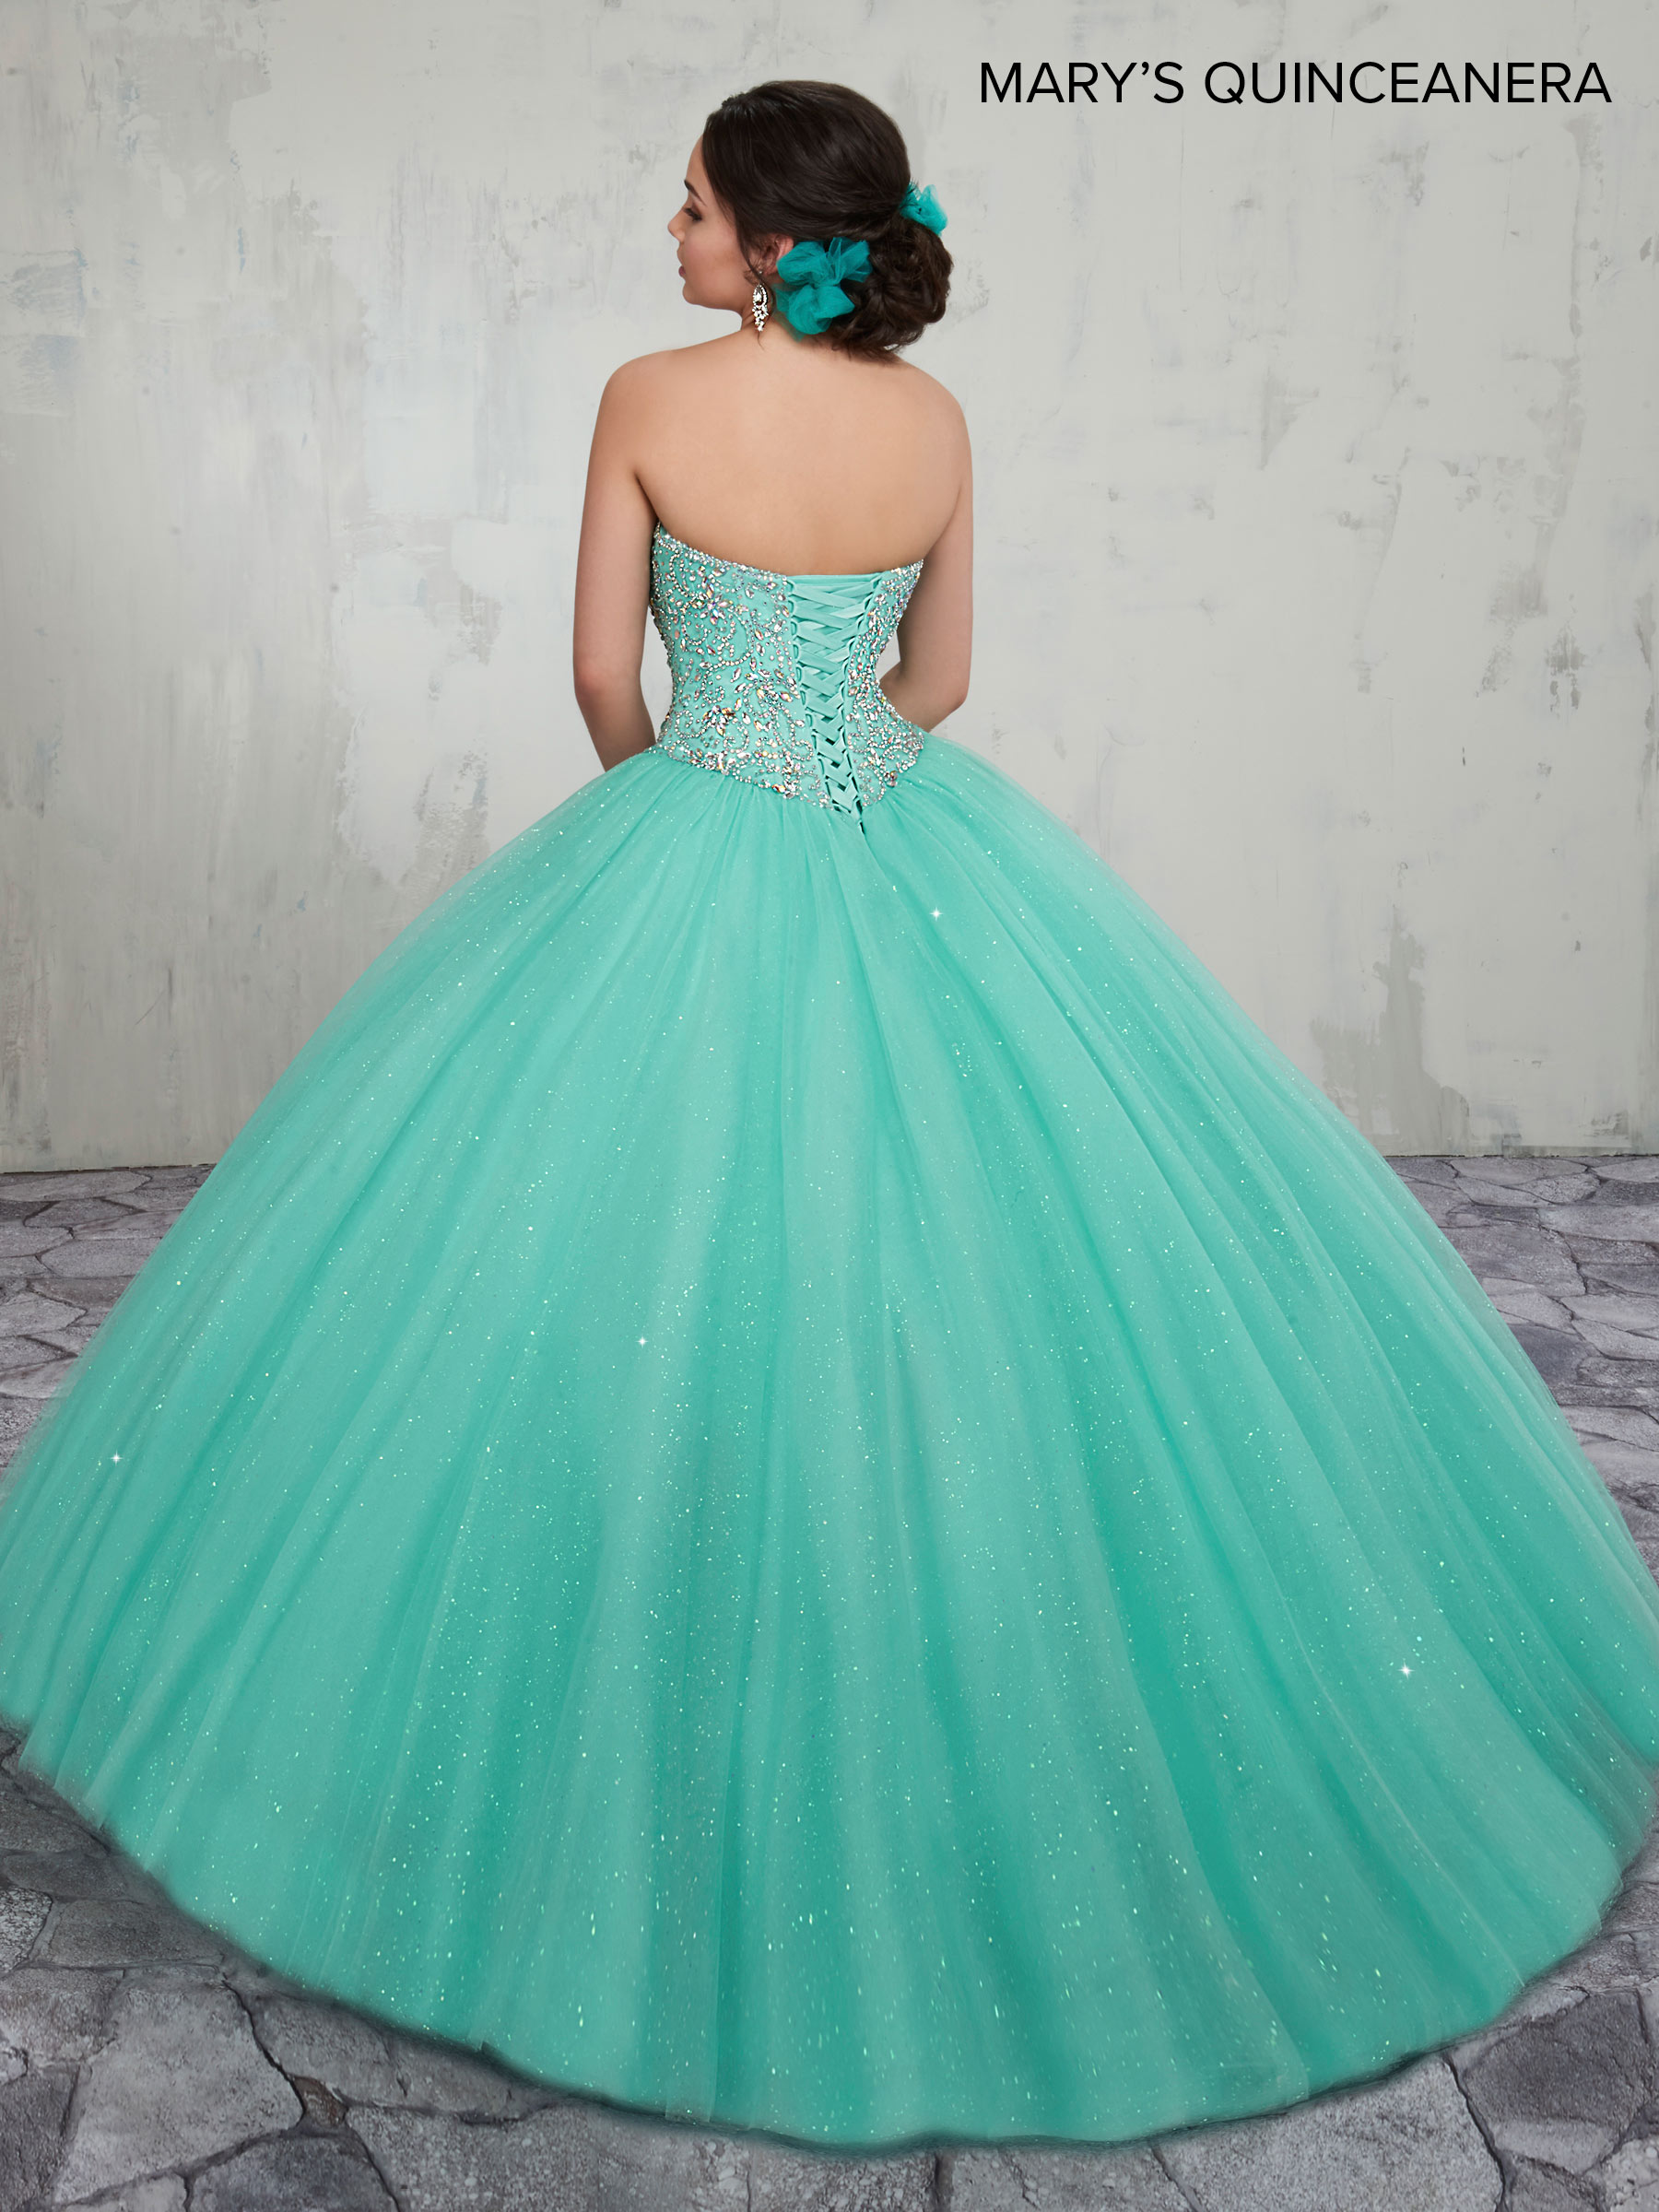 84477d76685 ... Marys Quinceanera Dresses